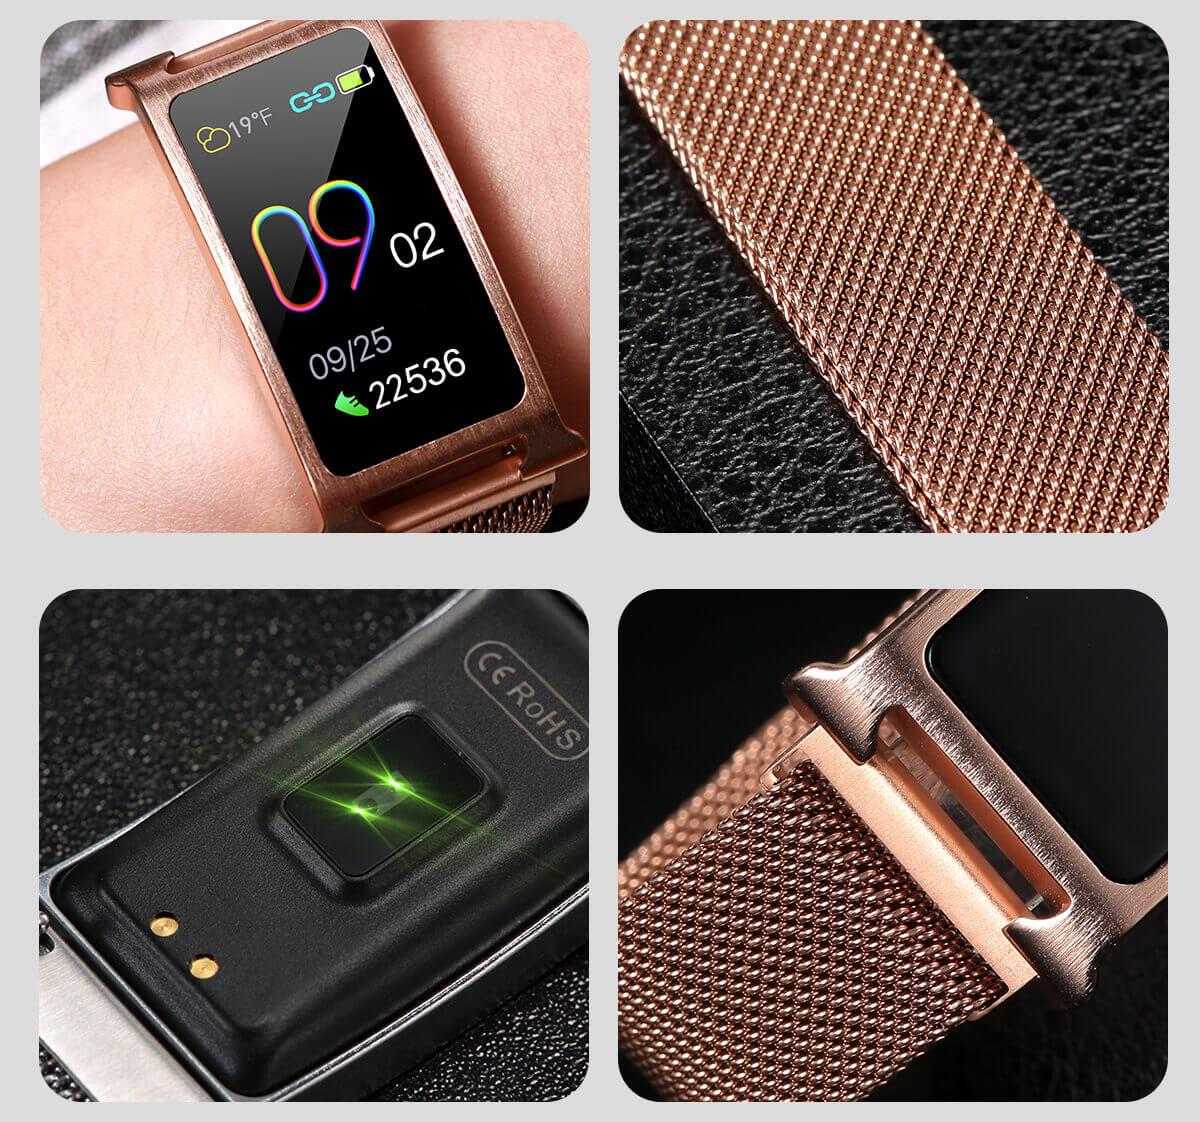 Chytrý kovový fitness náramek Smartomat Silentband 2 chytré hodinky 5